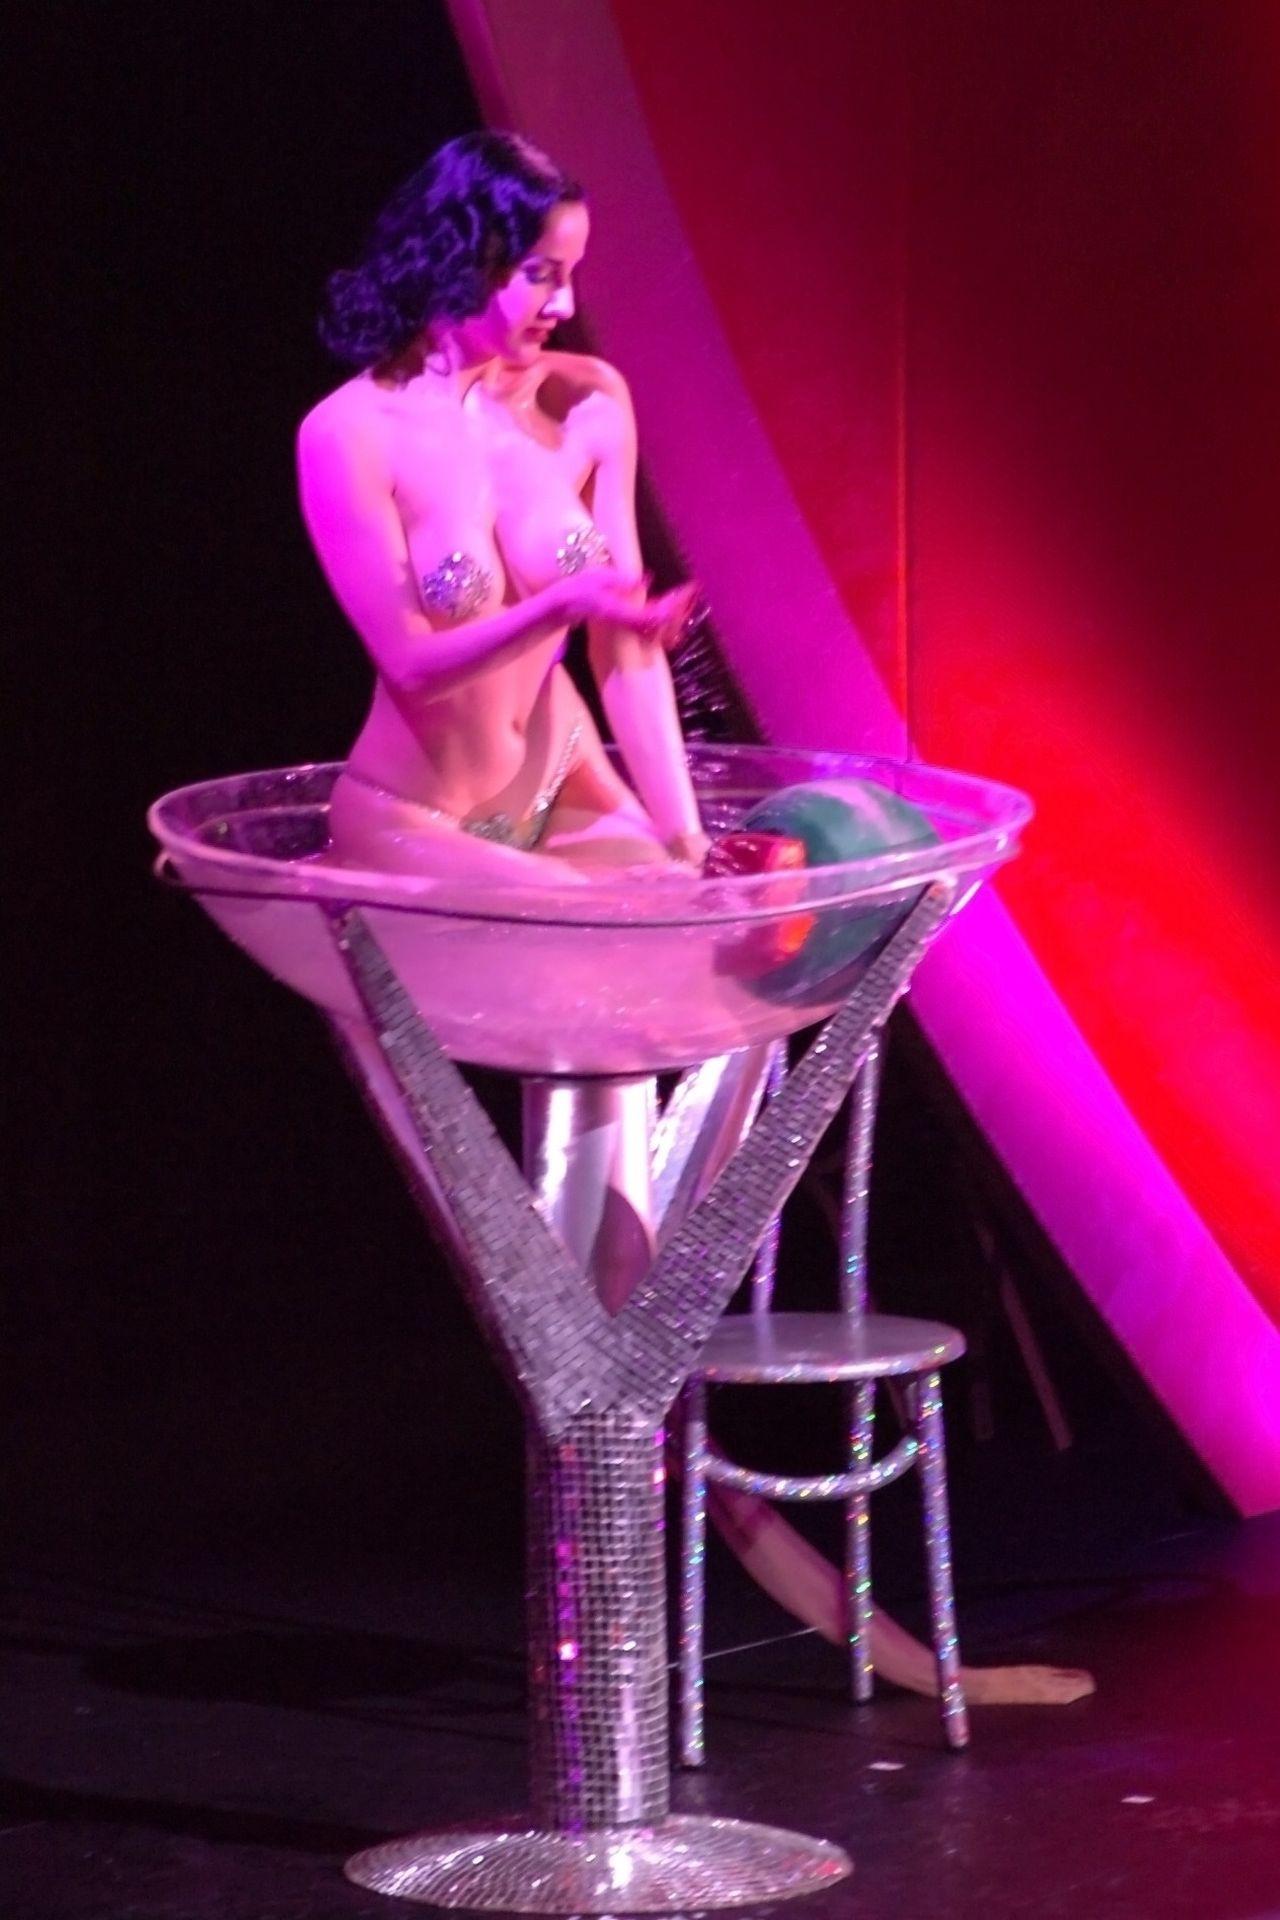 Dita Von Teese Performs At Erotica 06 In London 0027